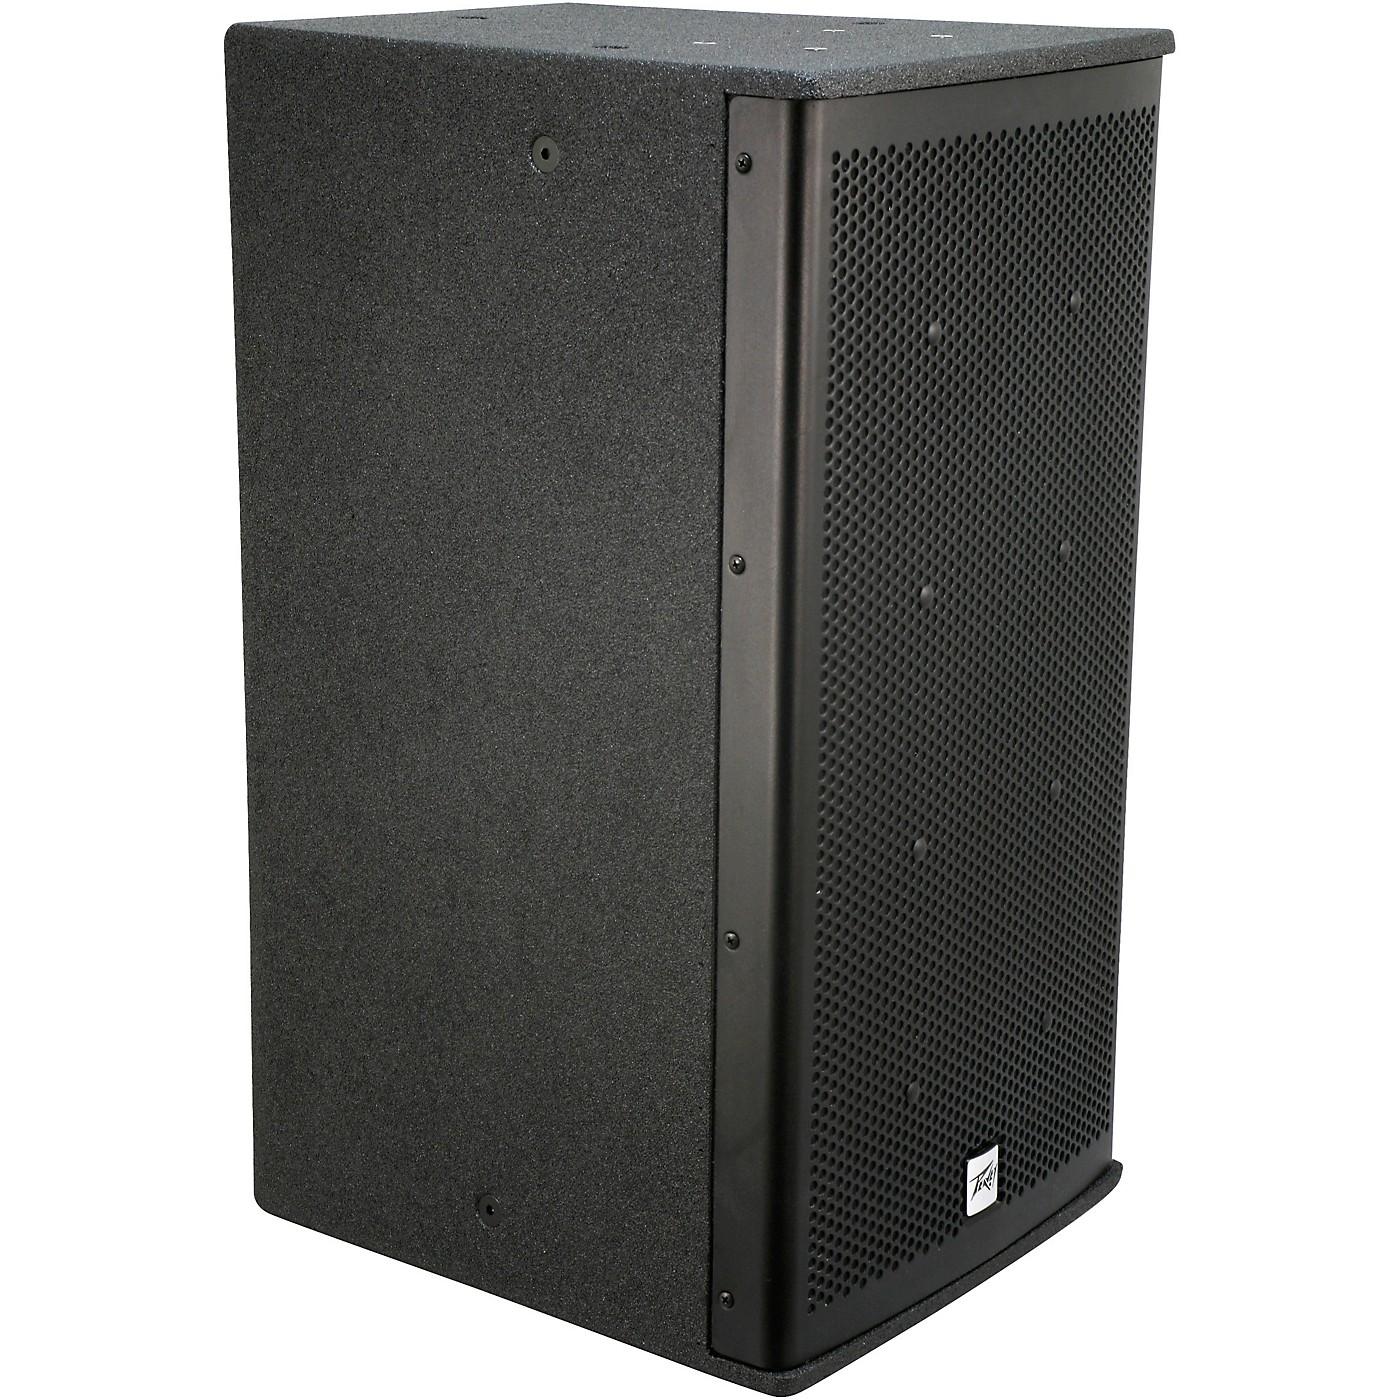 Peavey Elements 105X60RT Passive Weatherproof Outdoor Professional Speaker thumbnail